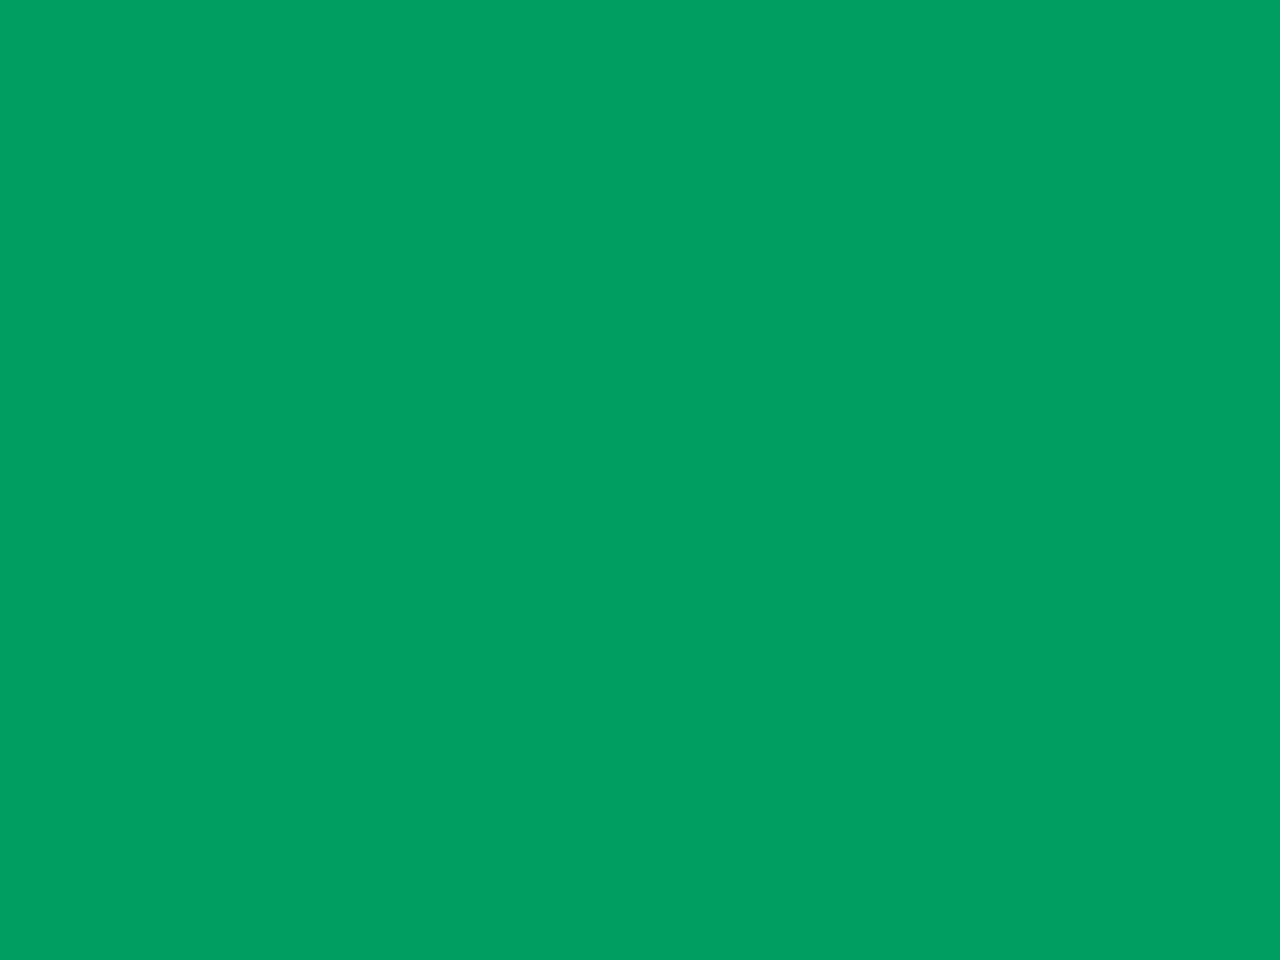 1280x960 Shamrock Green Solid Color Background